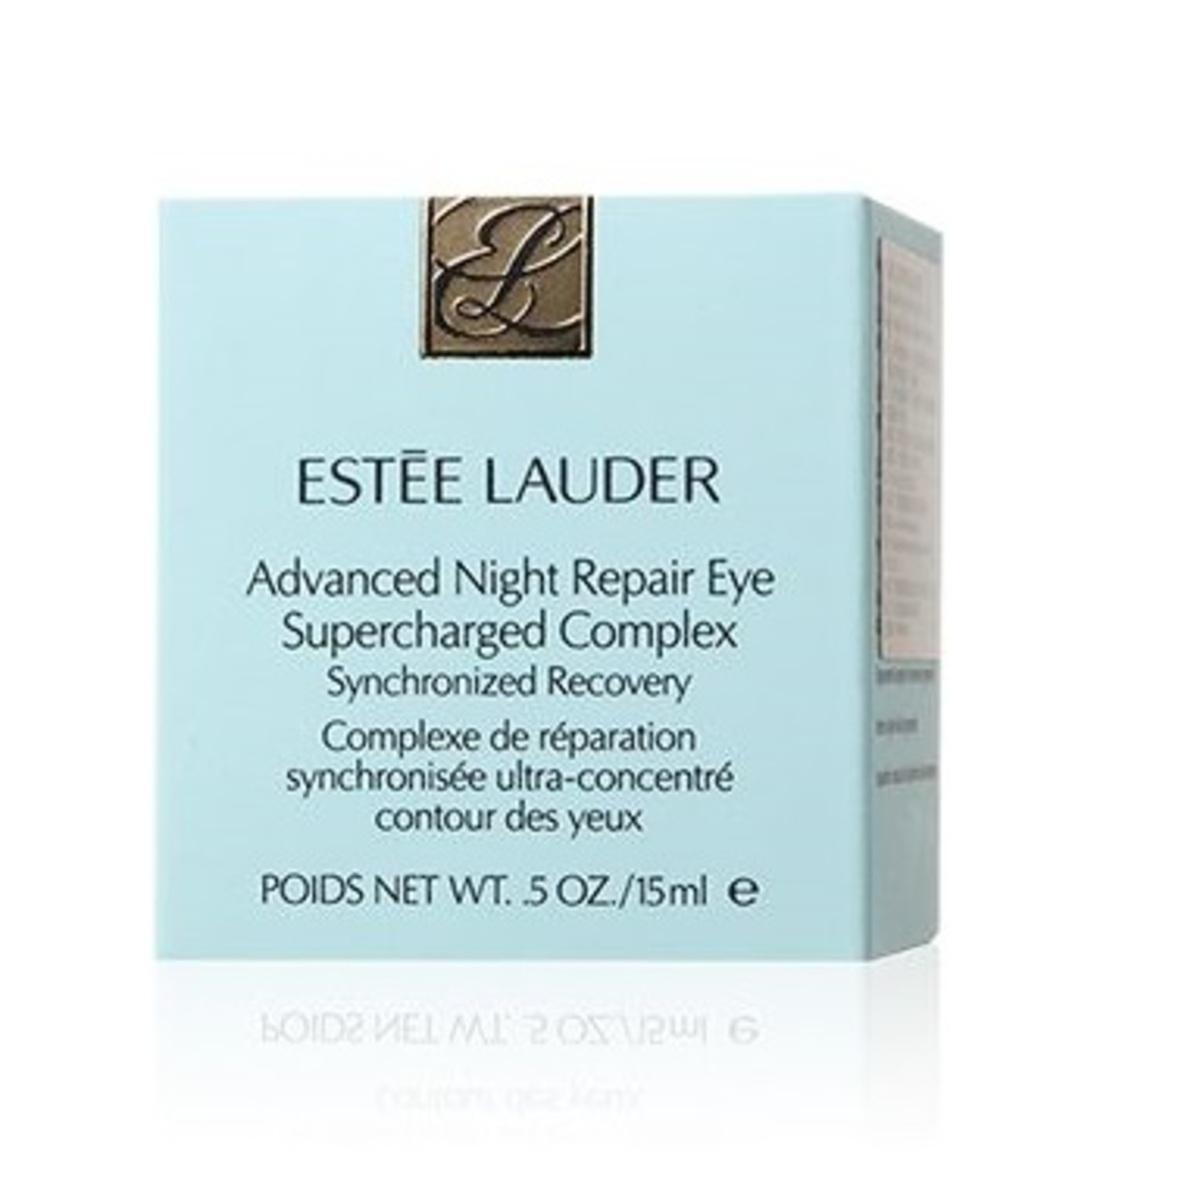 Advanced Night Repair Eye Supercharged Complex 15ml